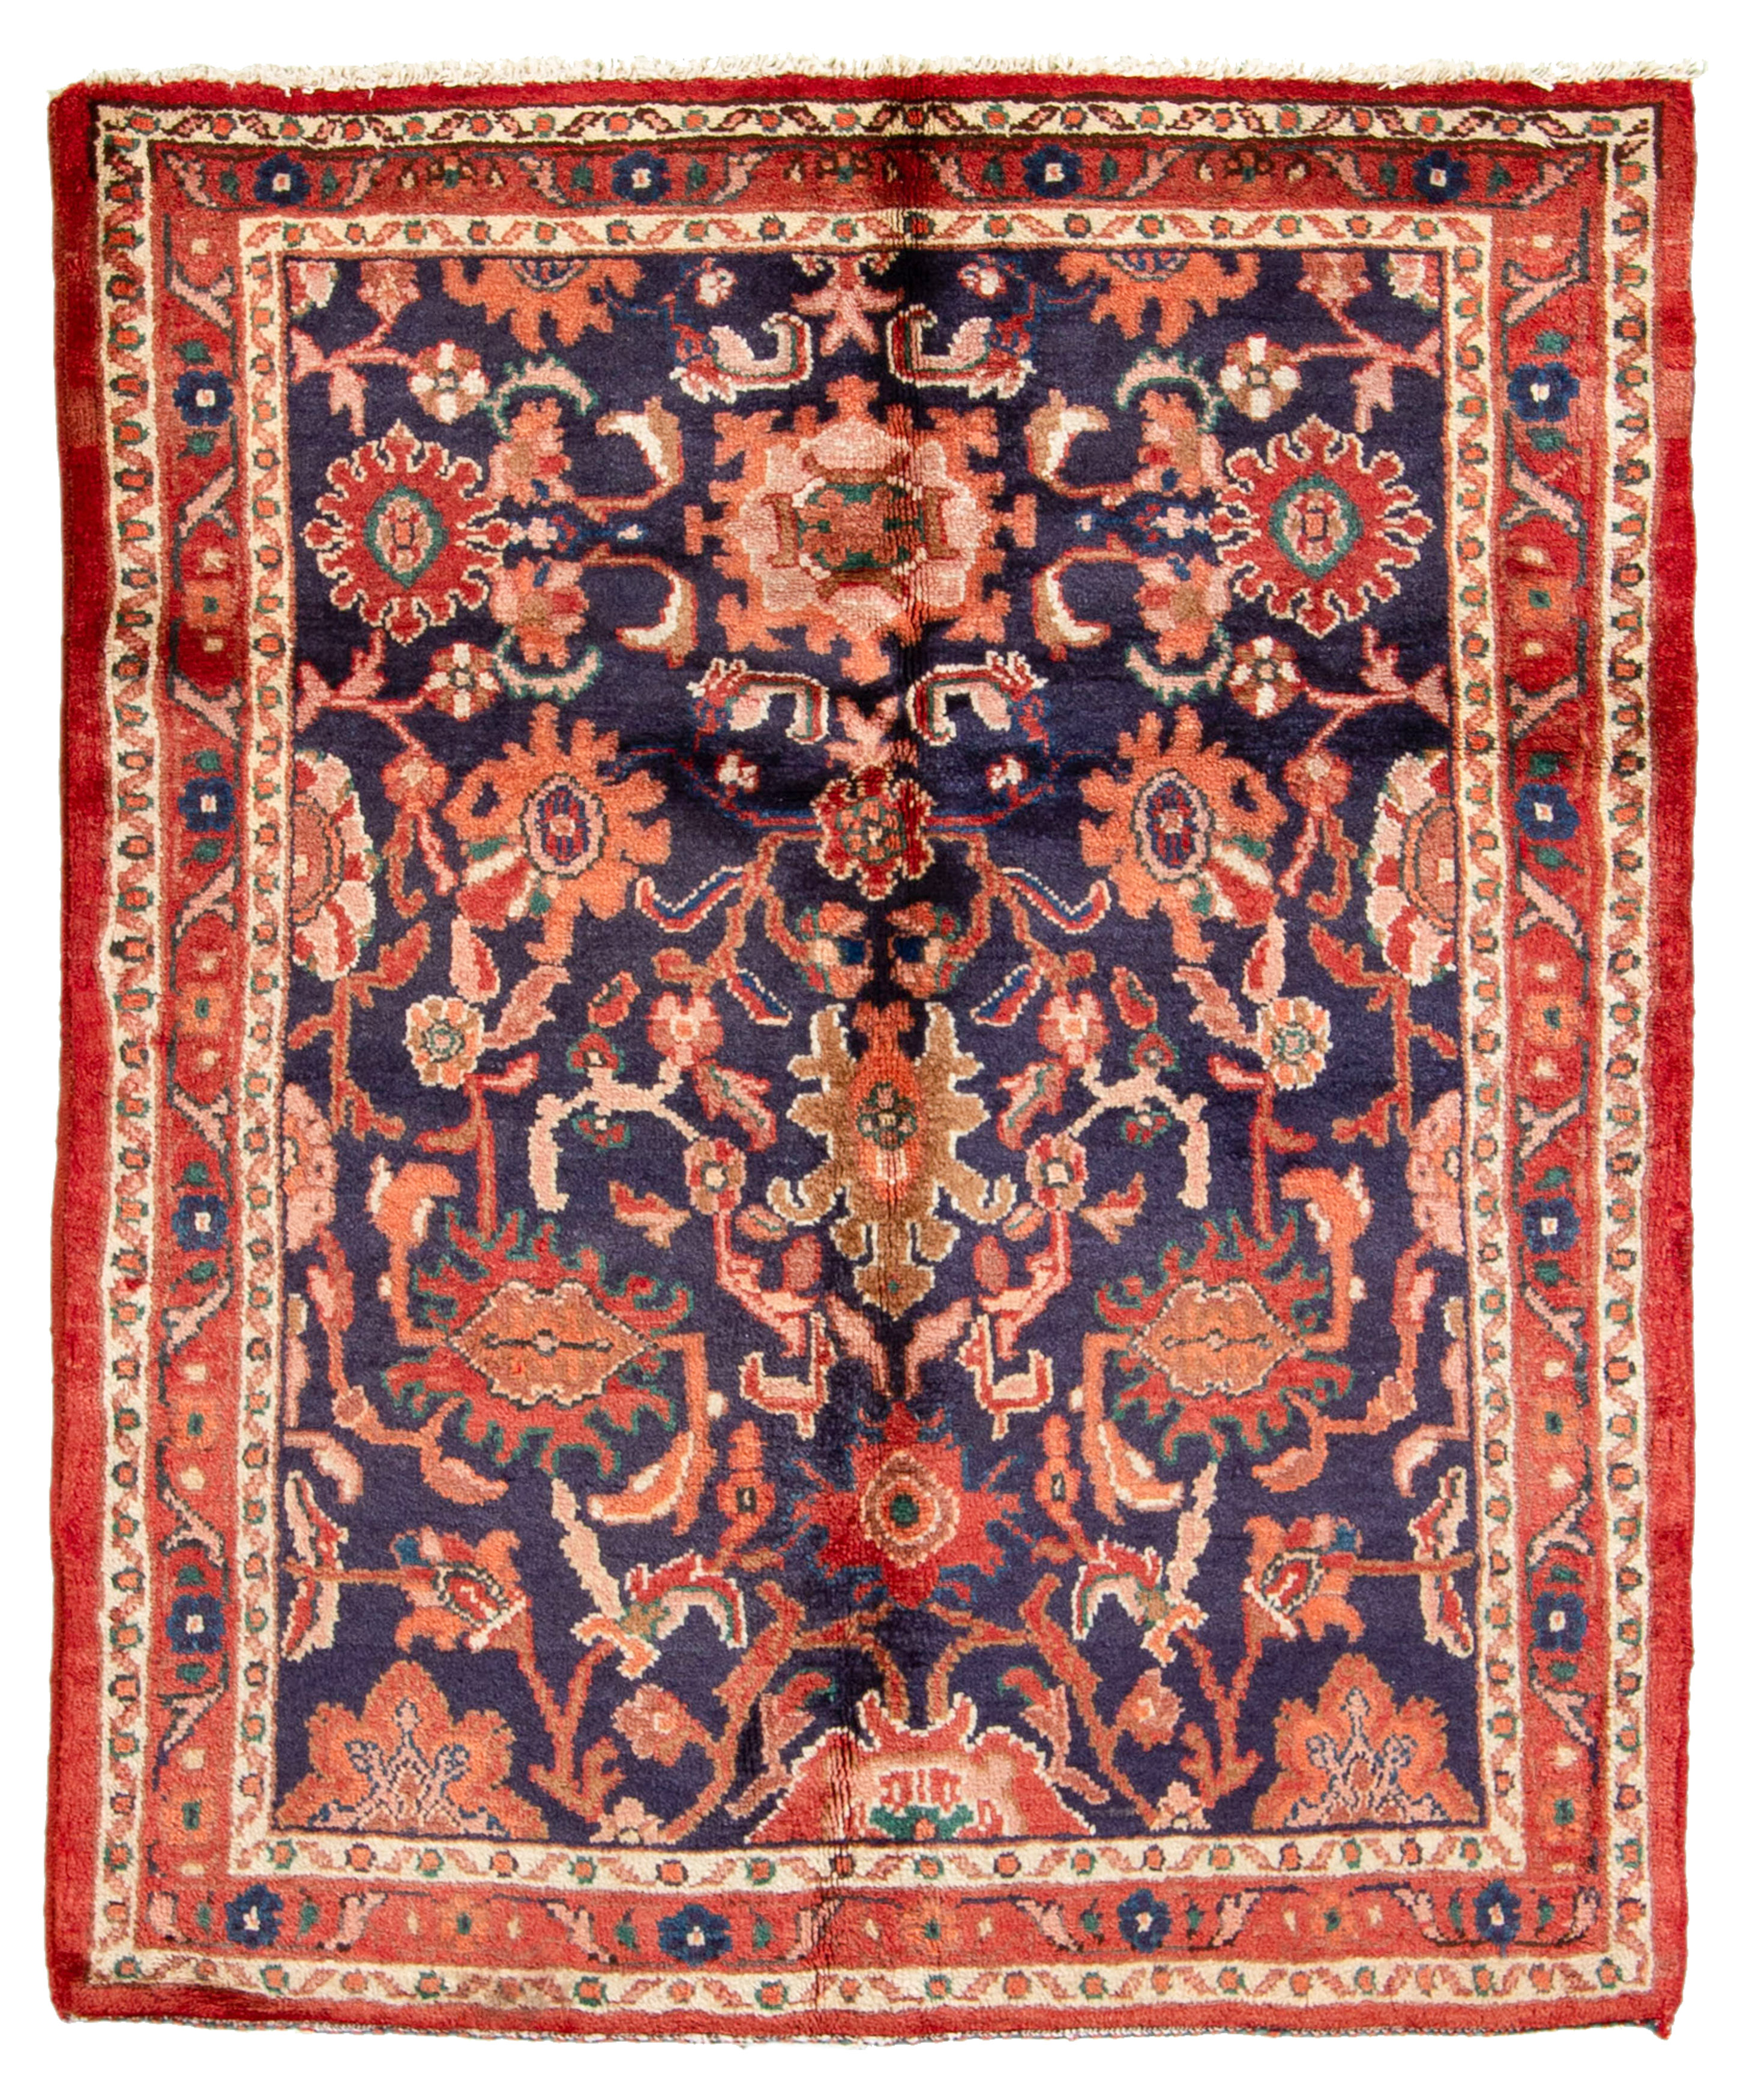 "Hand-knotted Hamadan  Wool Rug 3'8"" x 4'6"" Size: 3'8"" x 4'6"""